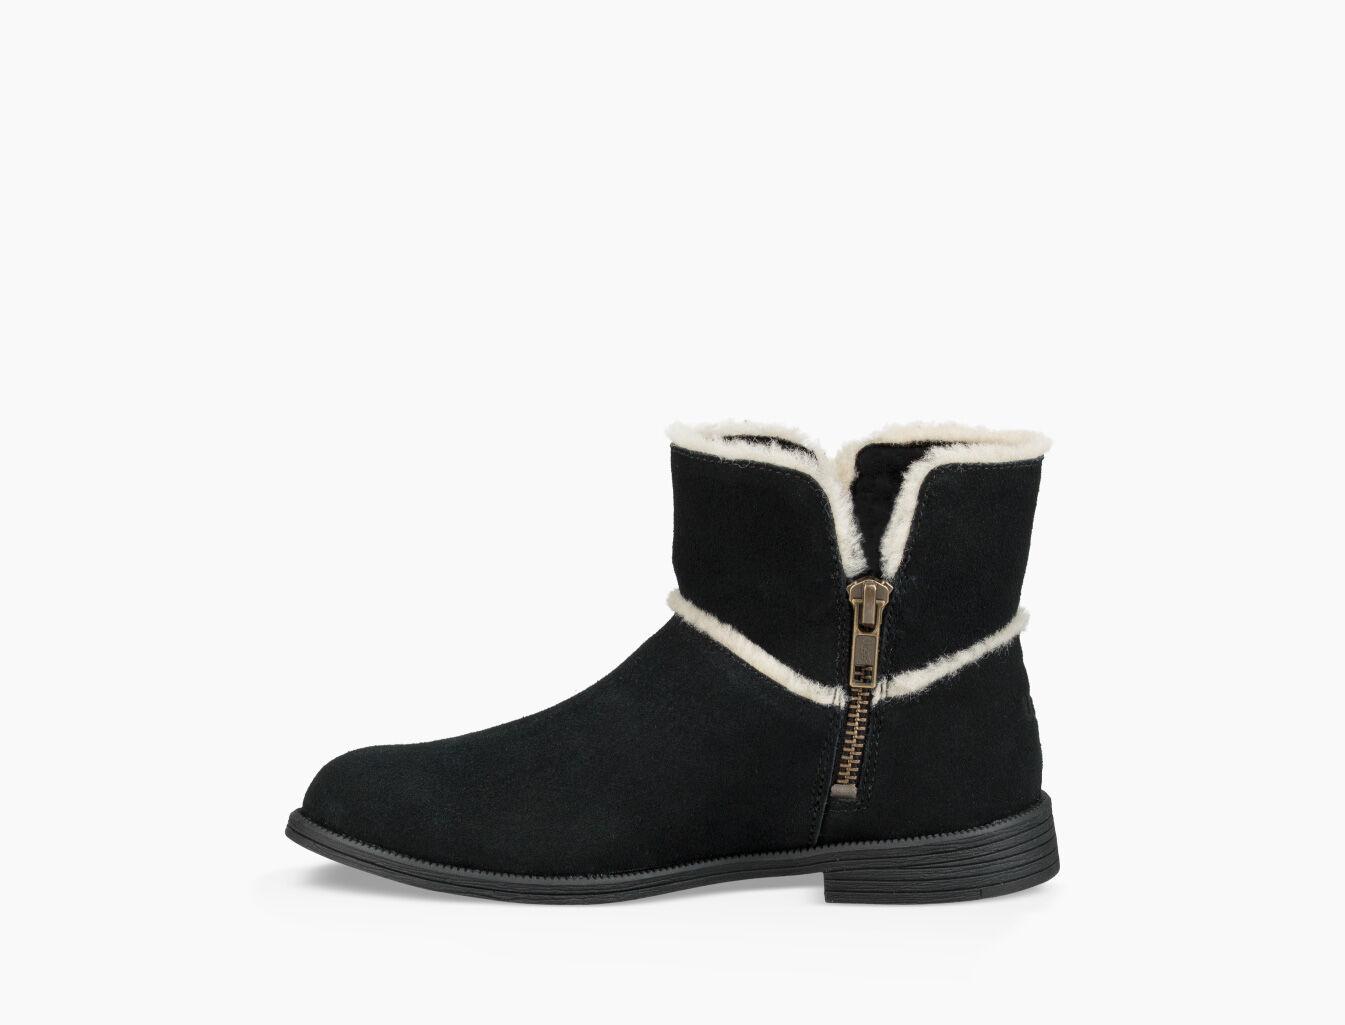 Ugg Boots Stiefel Lederstiefel Wolle Leder 37 Reißverschluss NEU